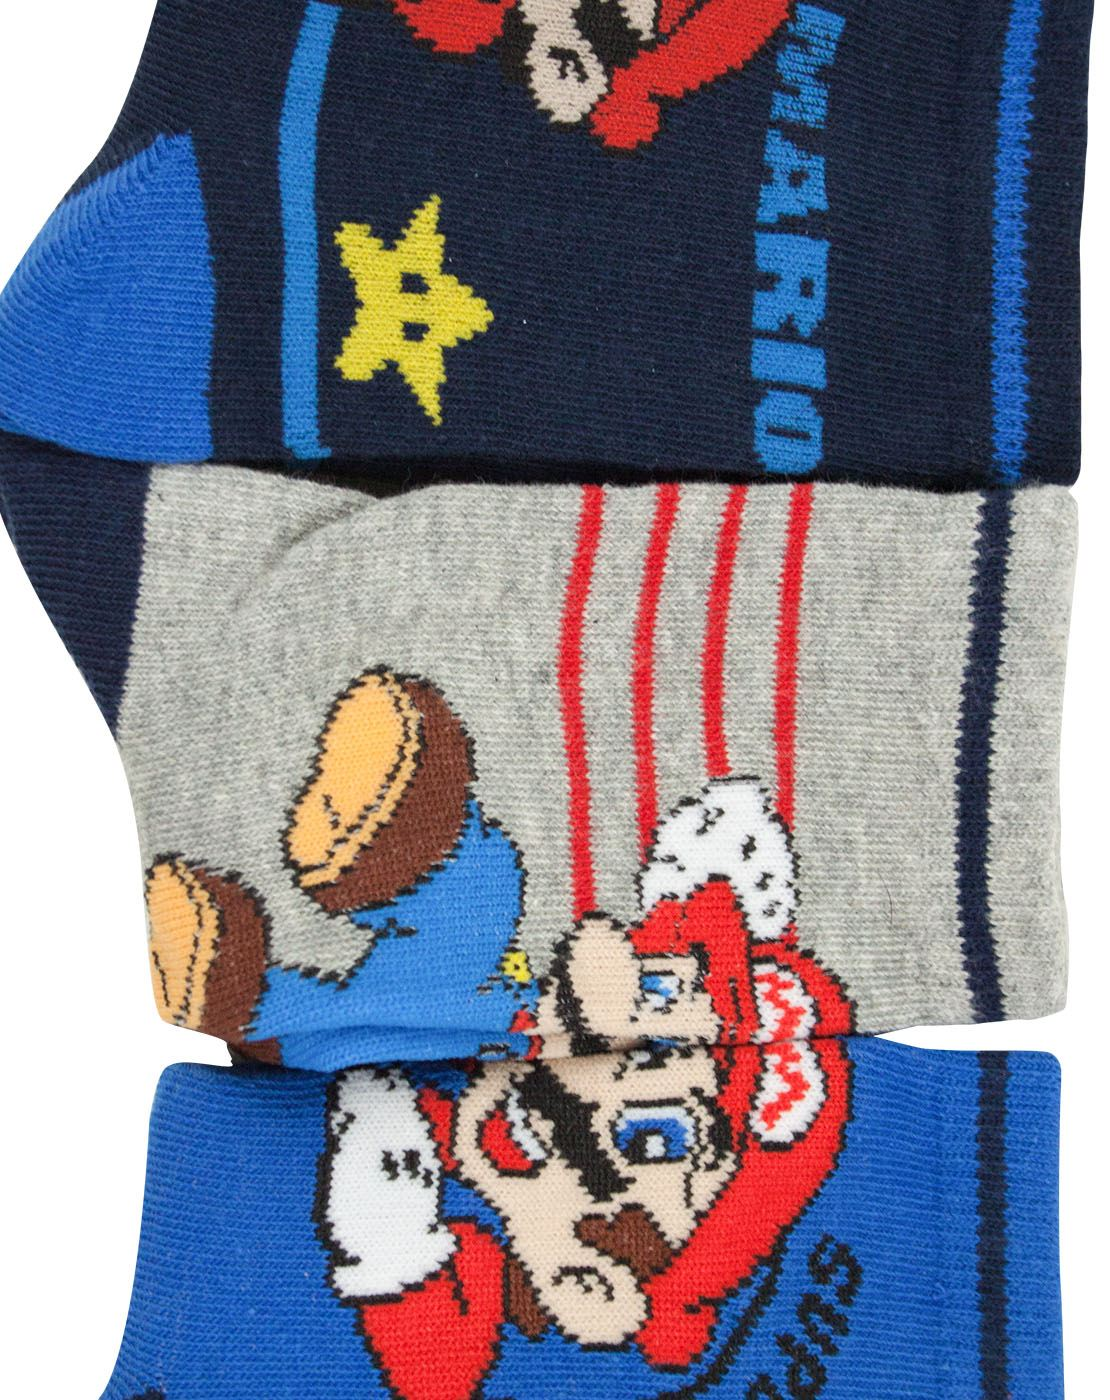 e7fb75805 Super Mario Boys Assorted 6 Pack Multi-coloured Sock Set | eBay